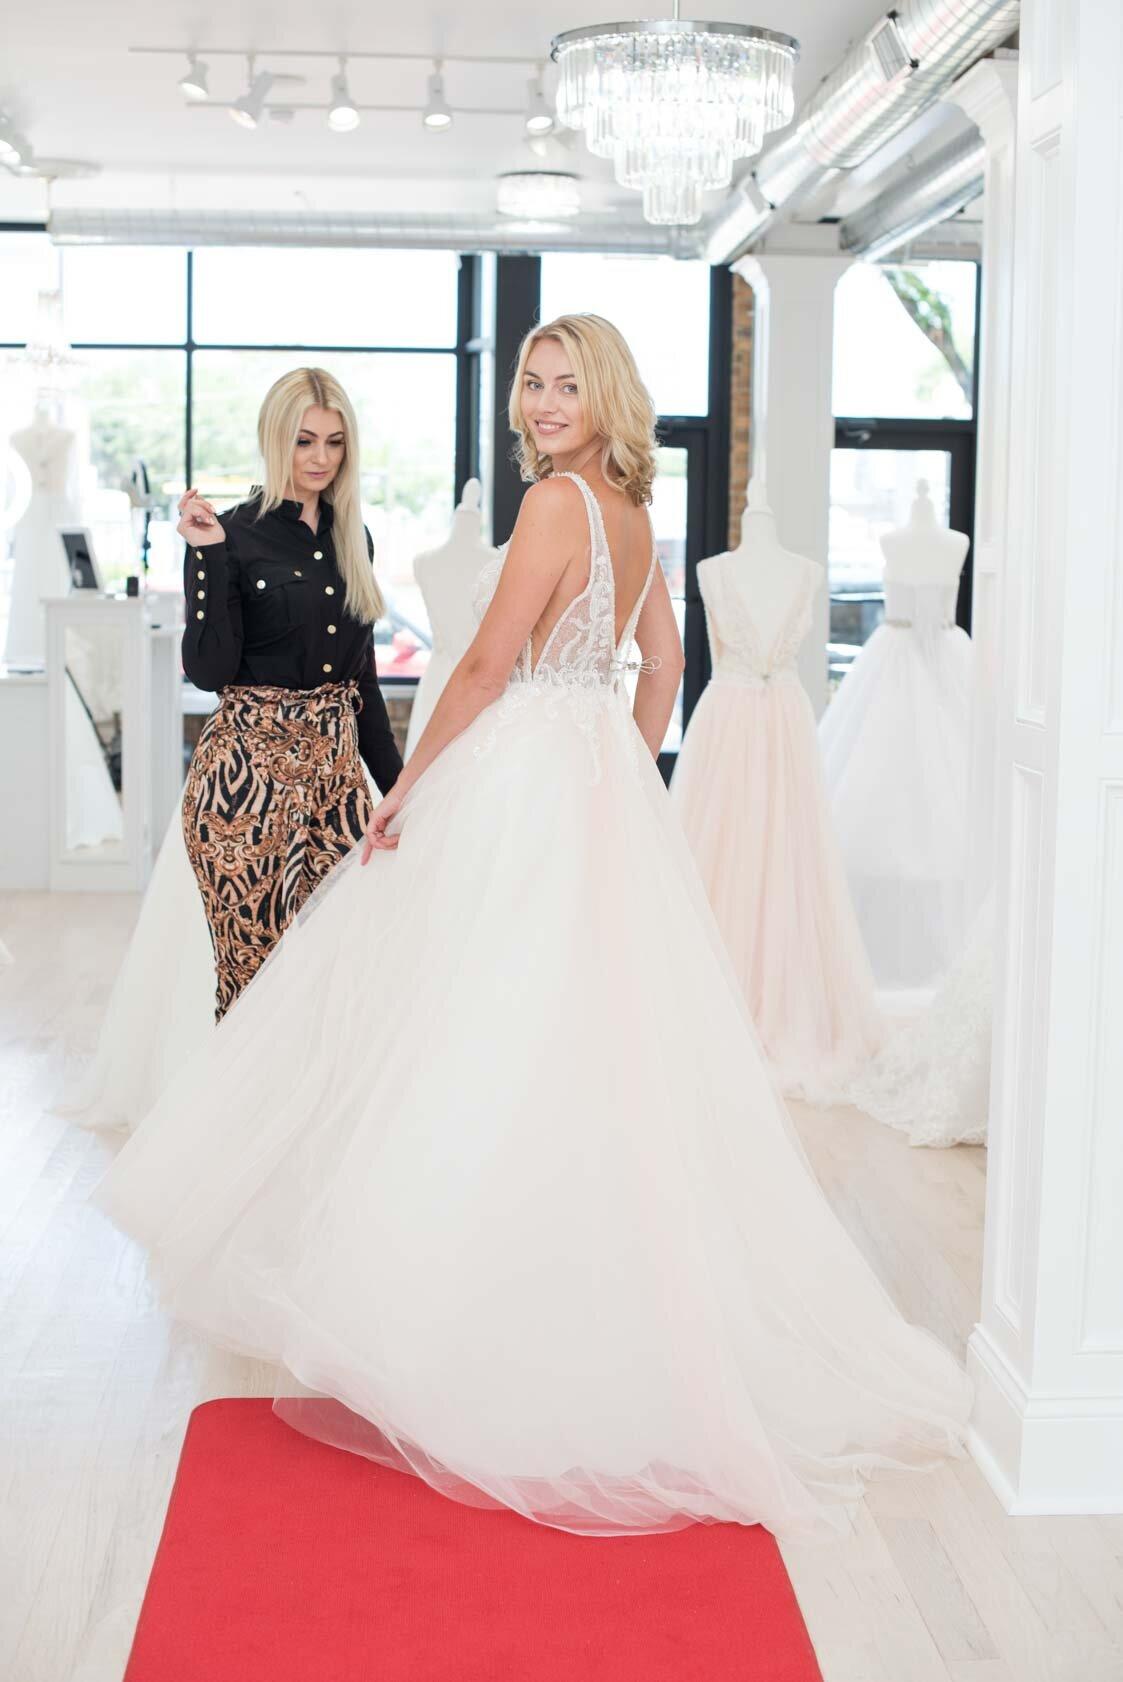 European Wedding Dresses Bridal Shop Bridal Store In Chicago